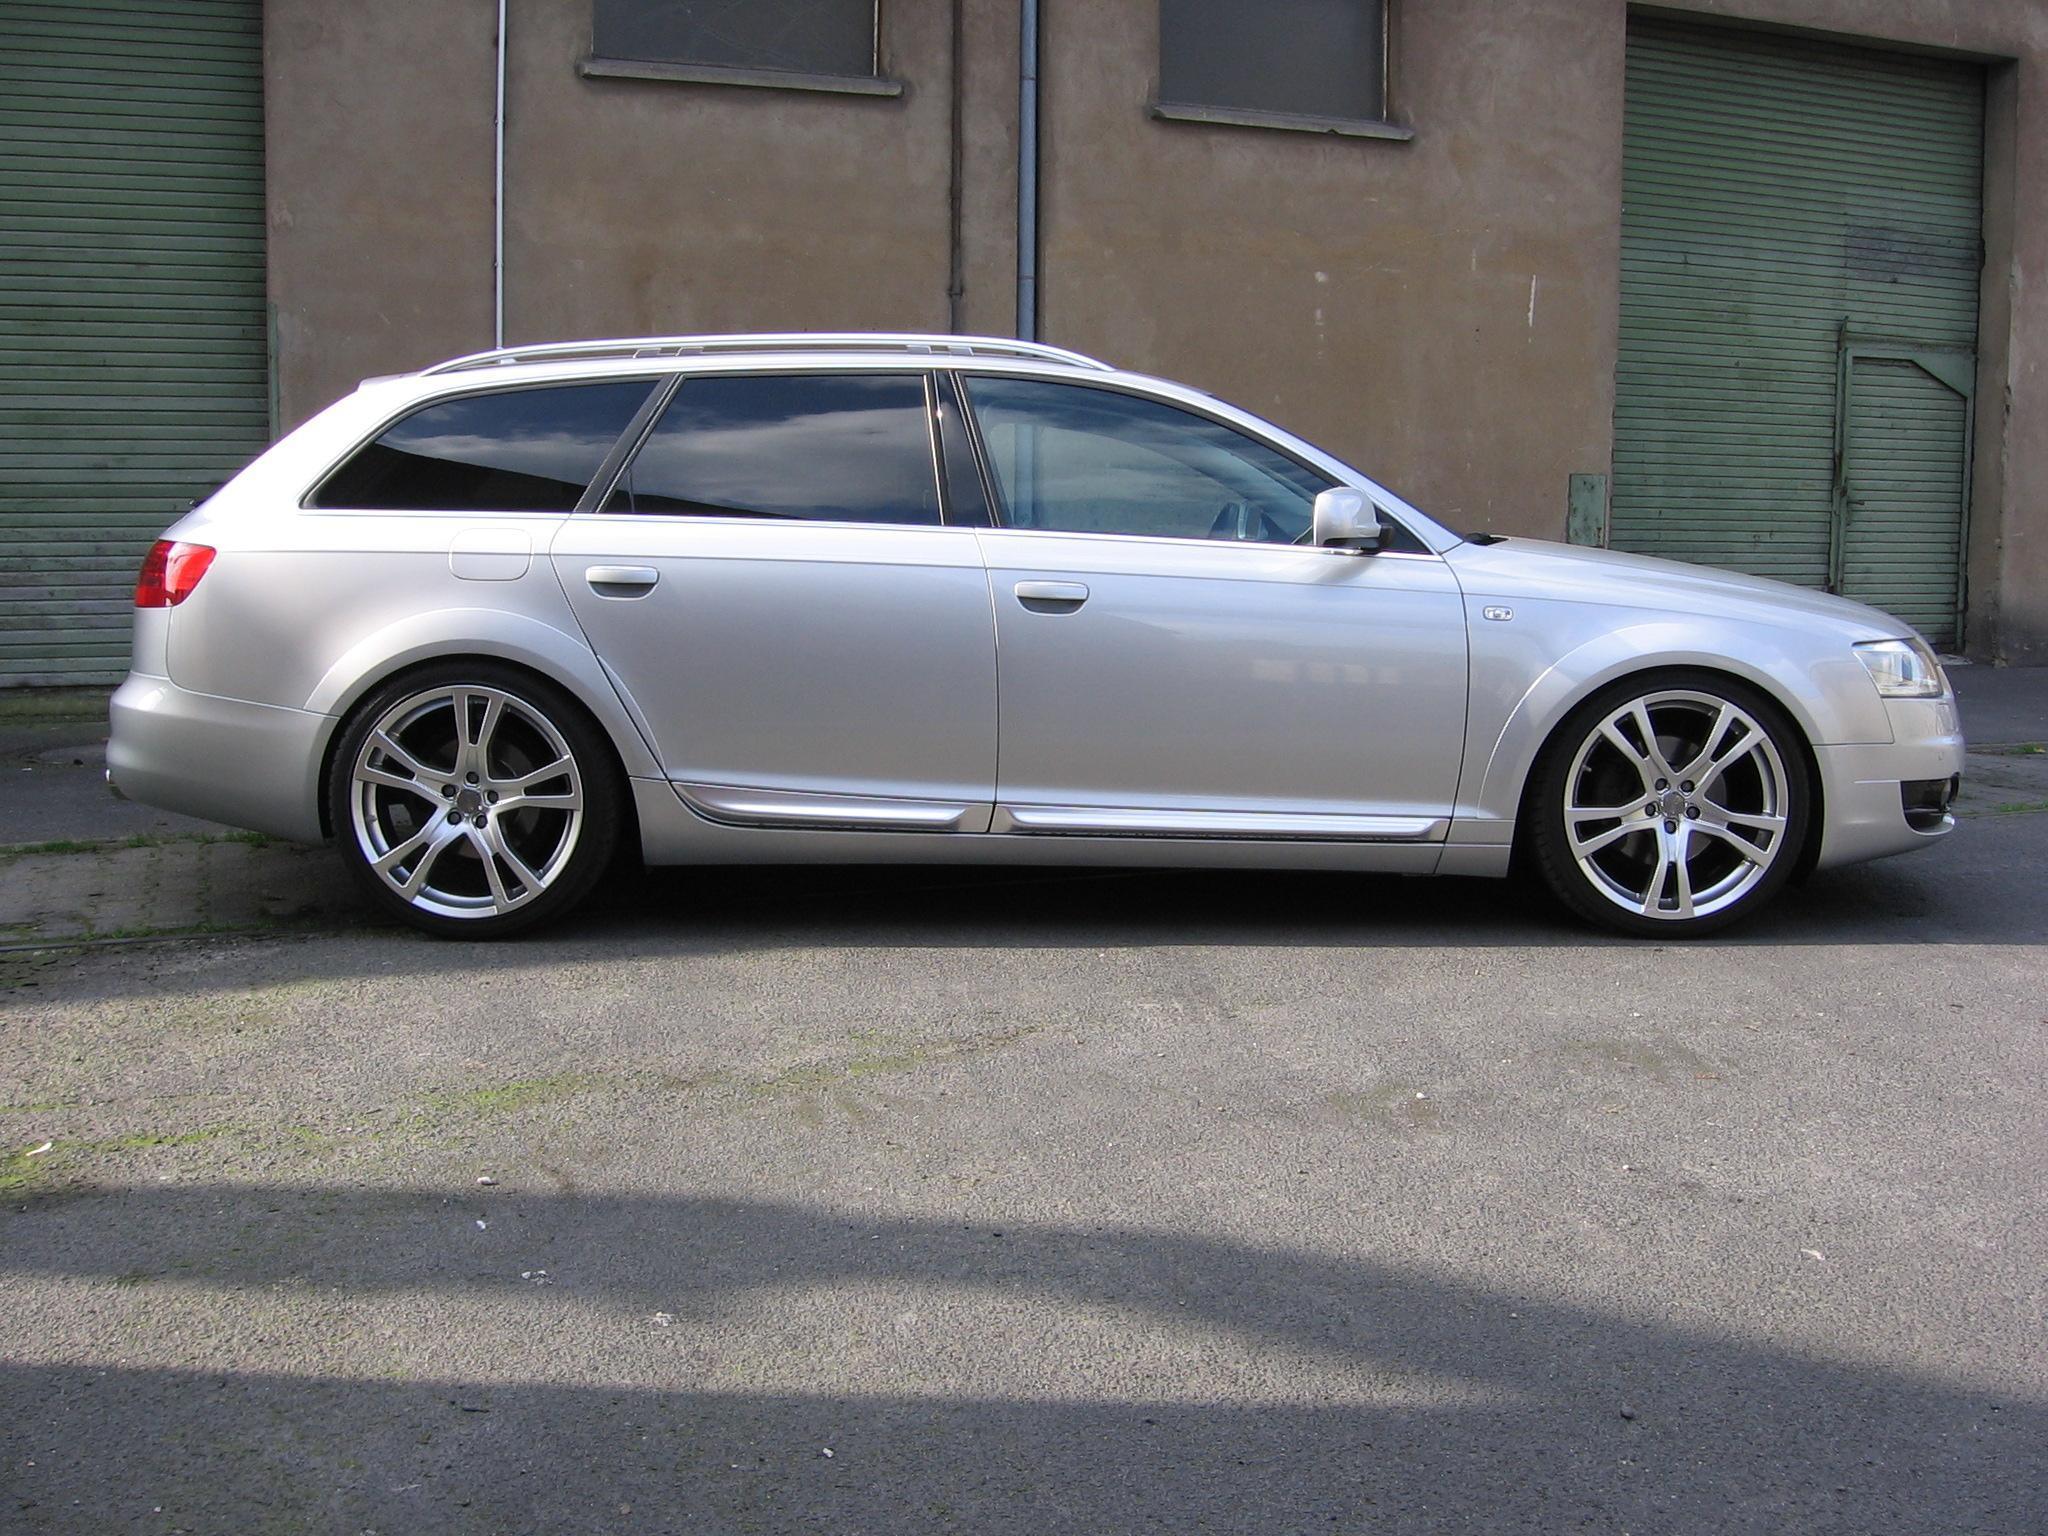 Auto Audi A6 Allroad 4f 3 0 Tdi Pagenstecher De Deine Automeile Im Netz